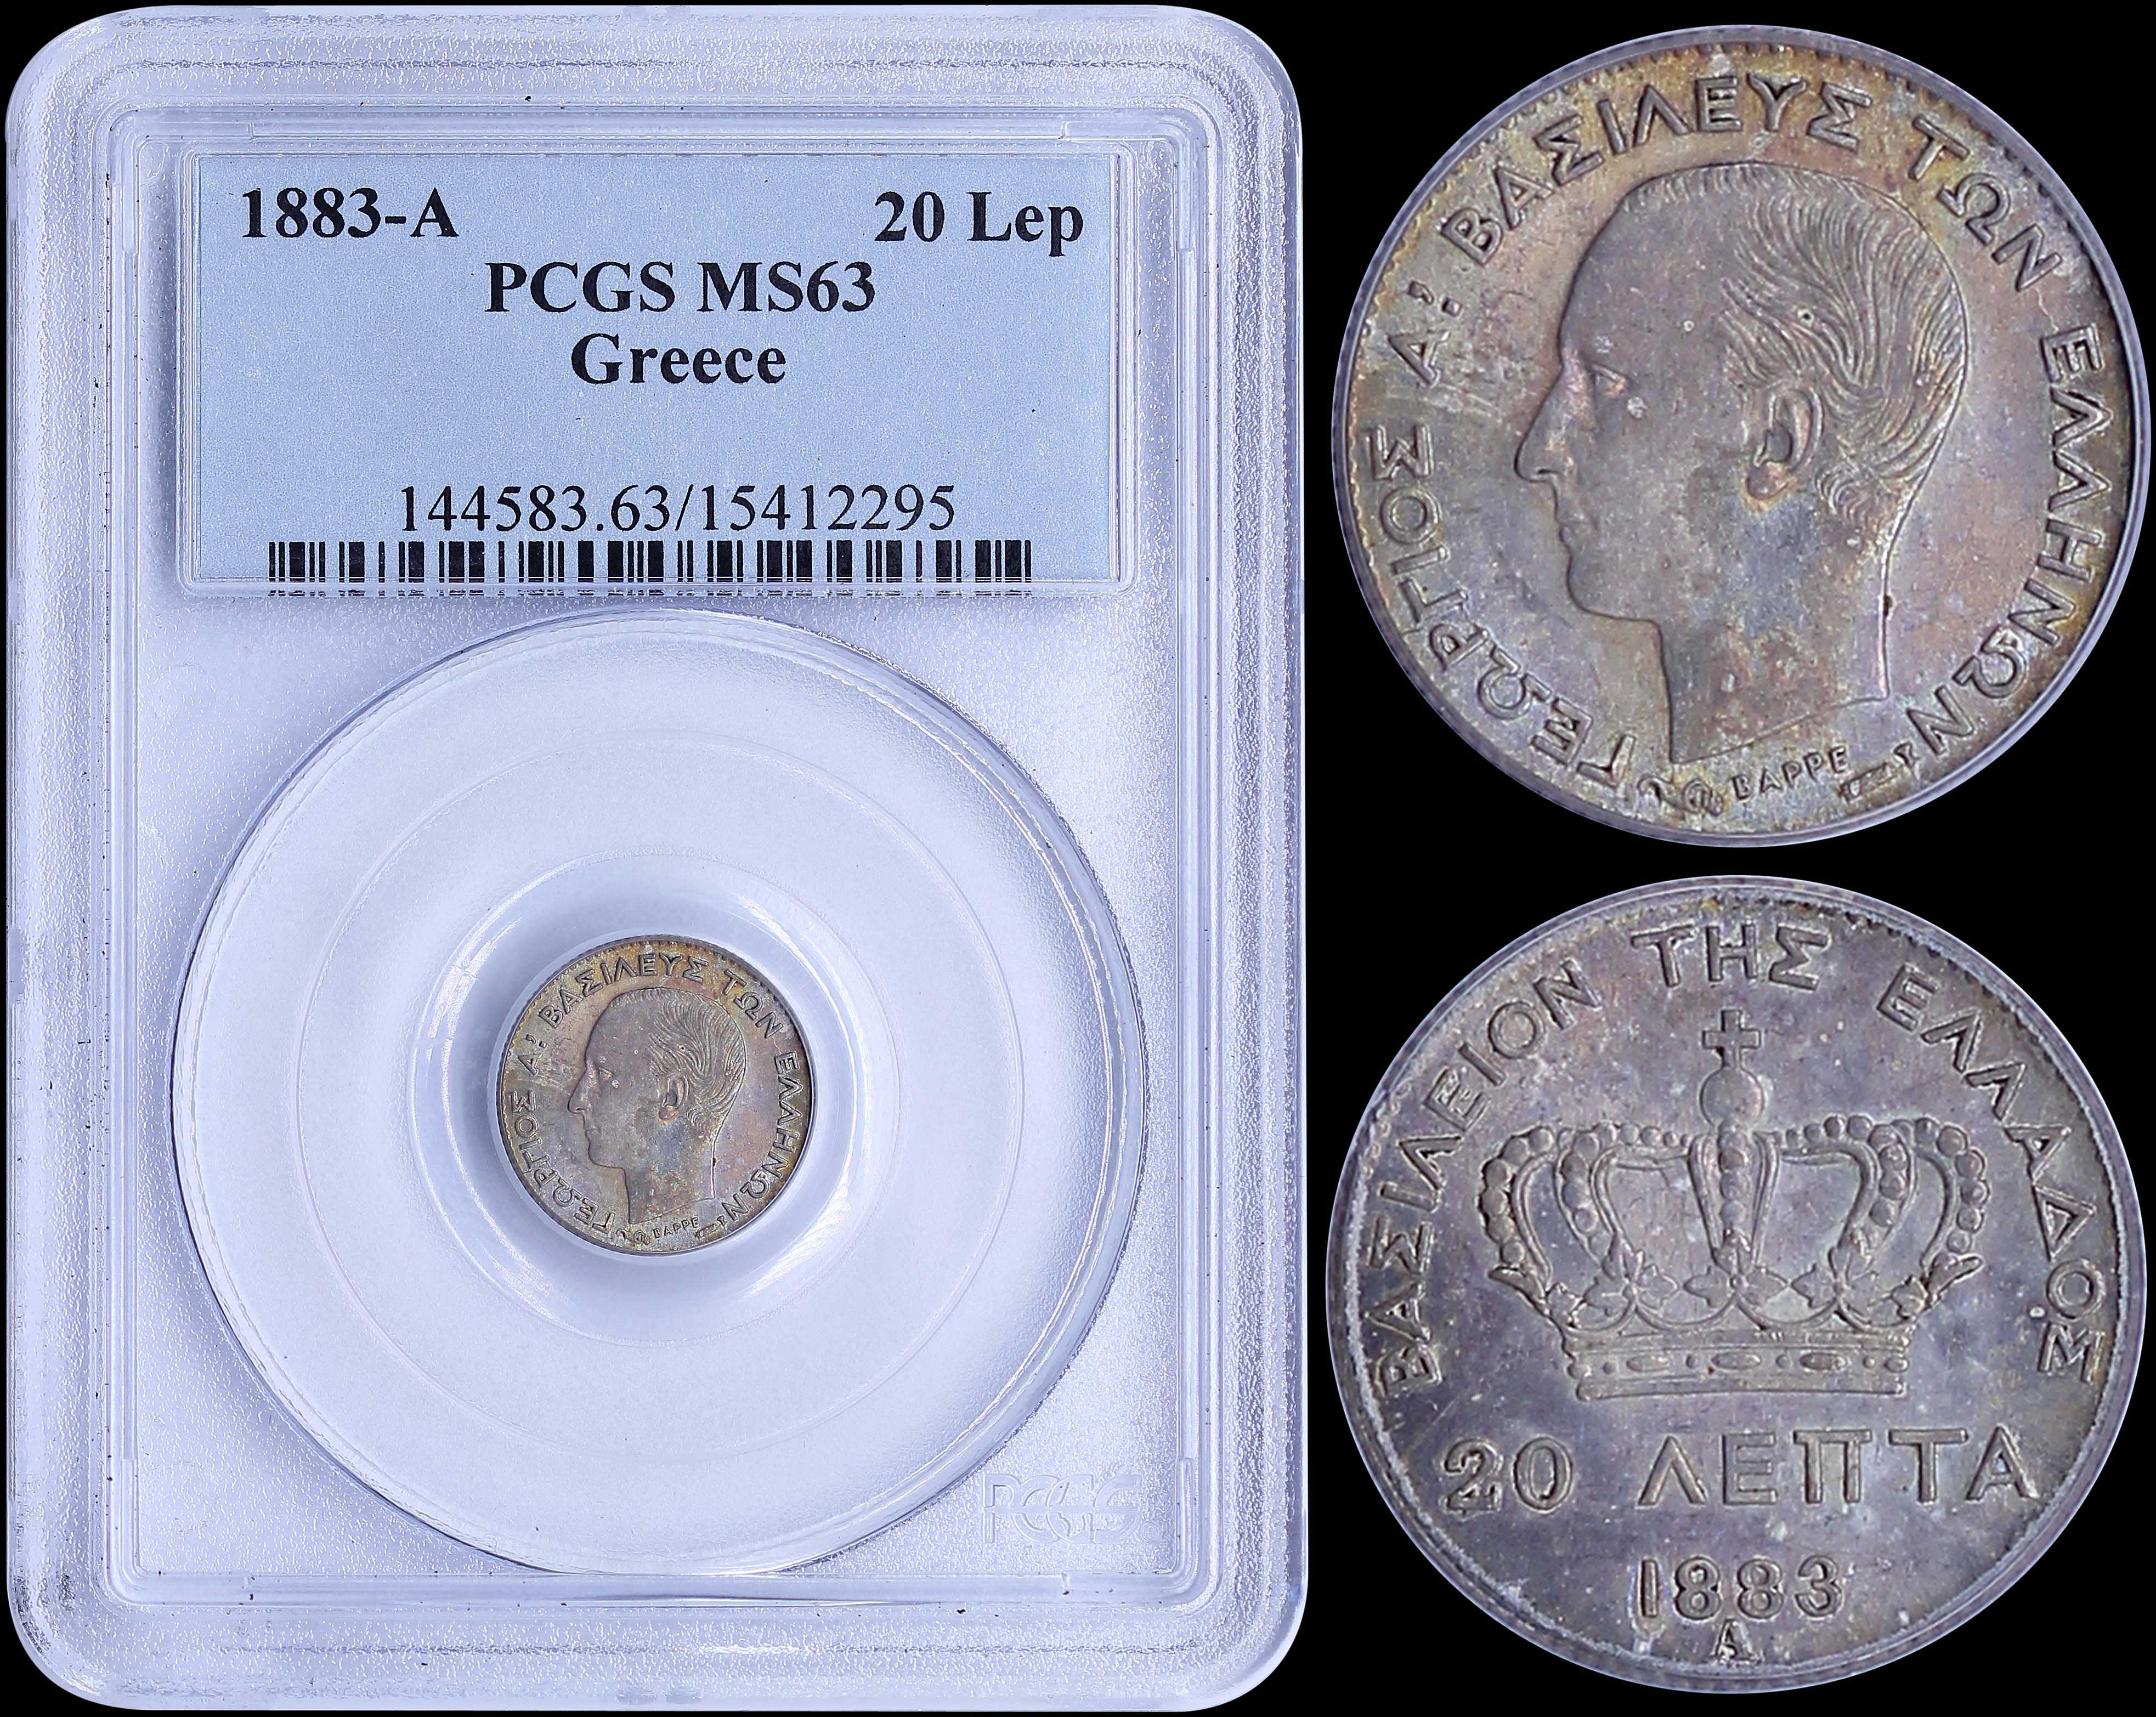 Lot 6102 - -  COINS & TOKENS king george i -  A. Karamitsos Public Auction 655